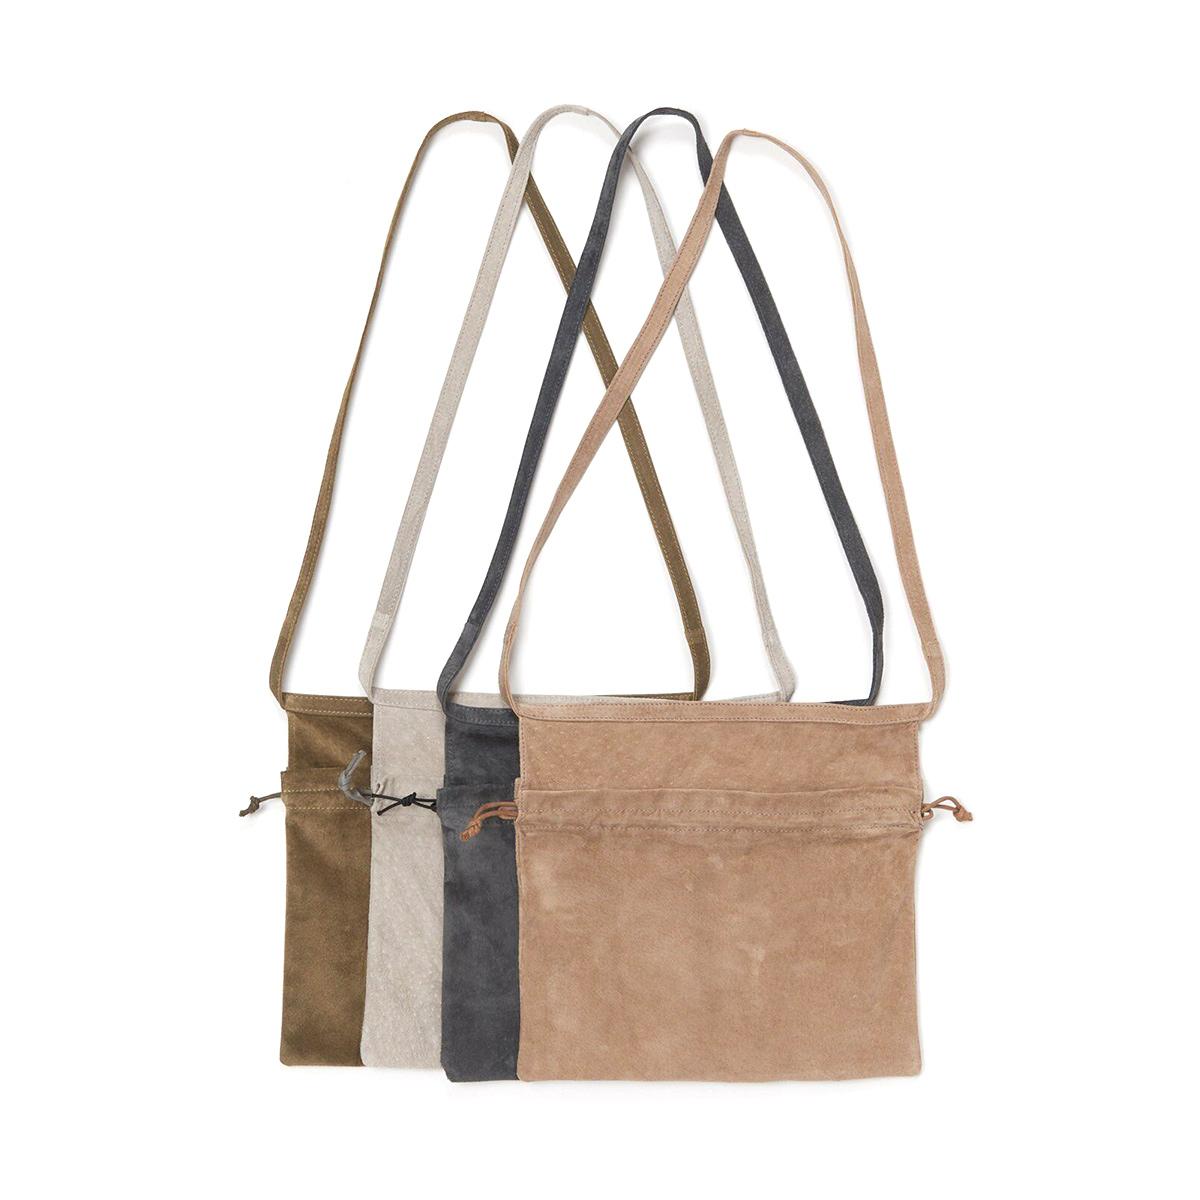 Hender Scheme / red cross bag small